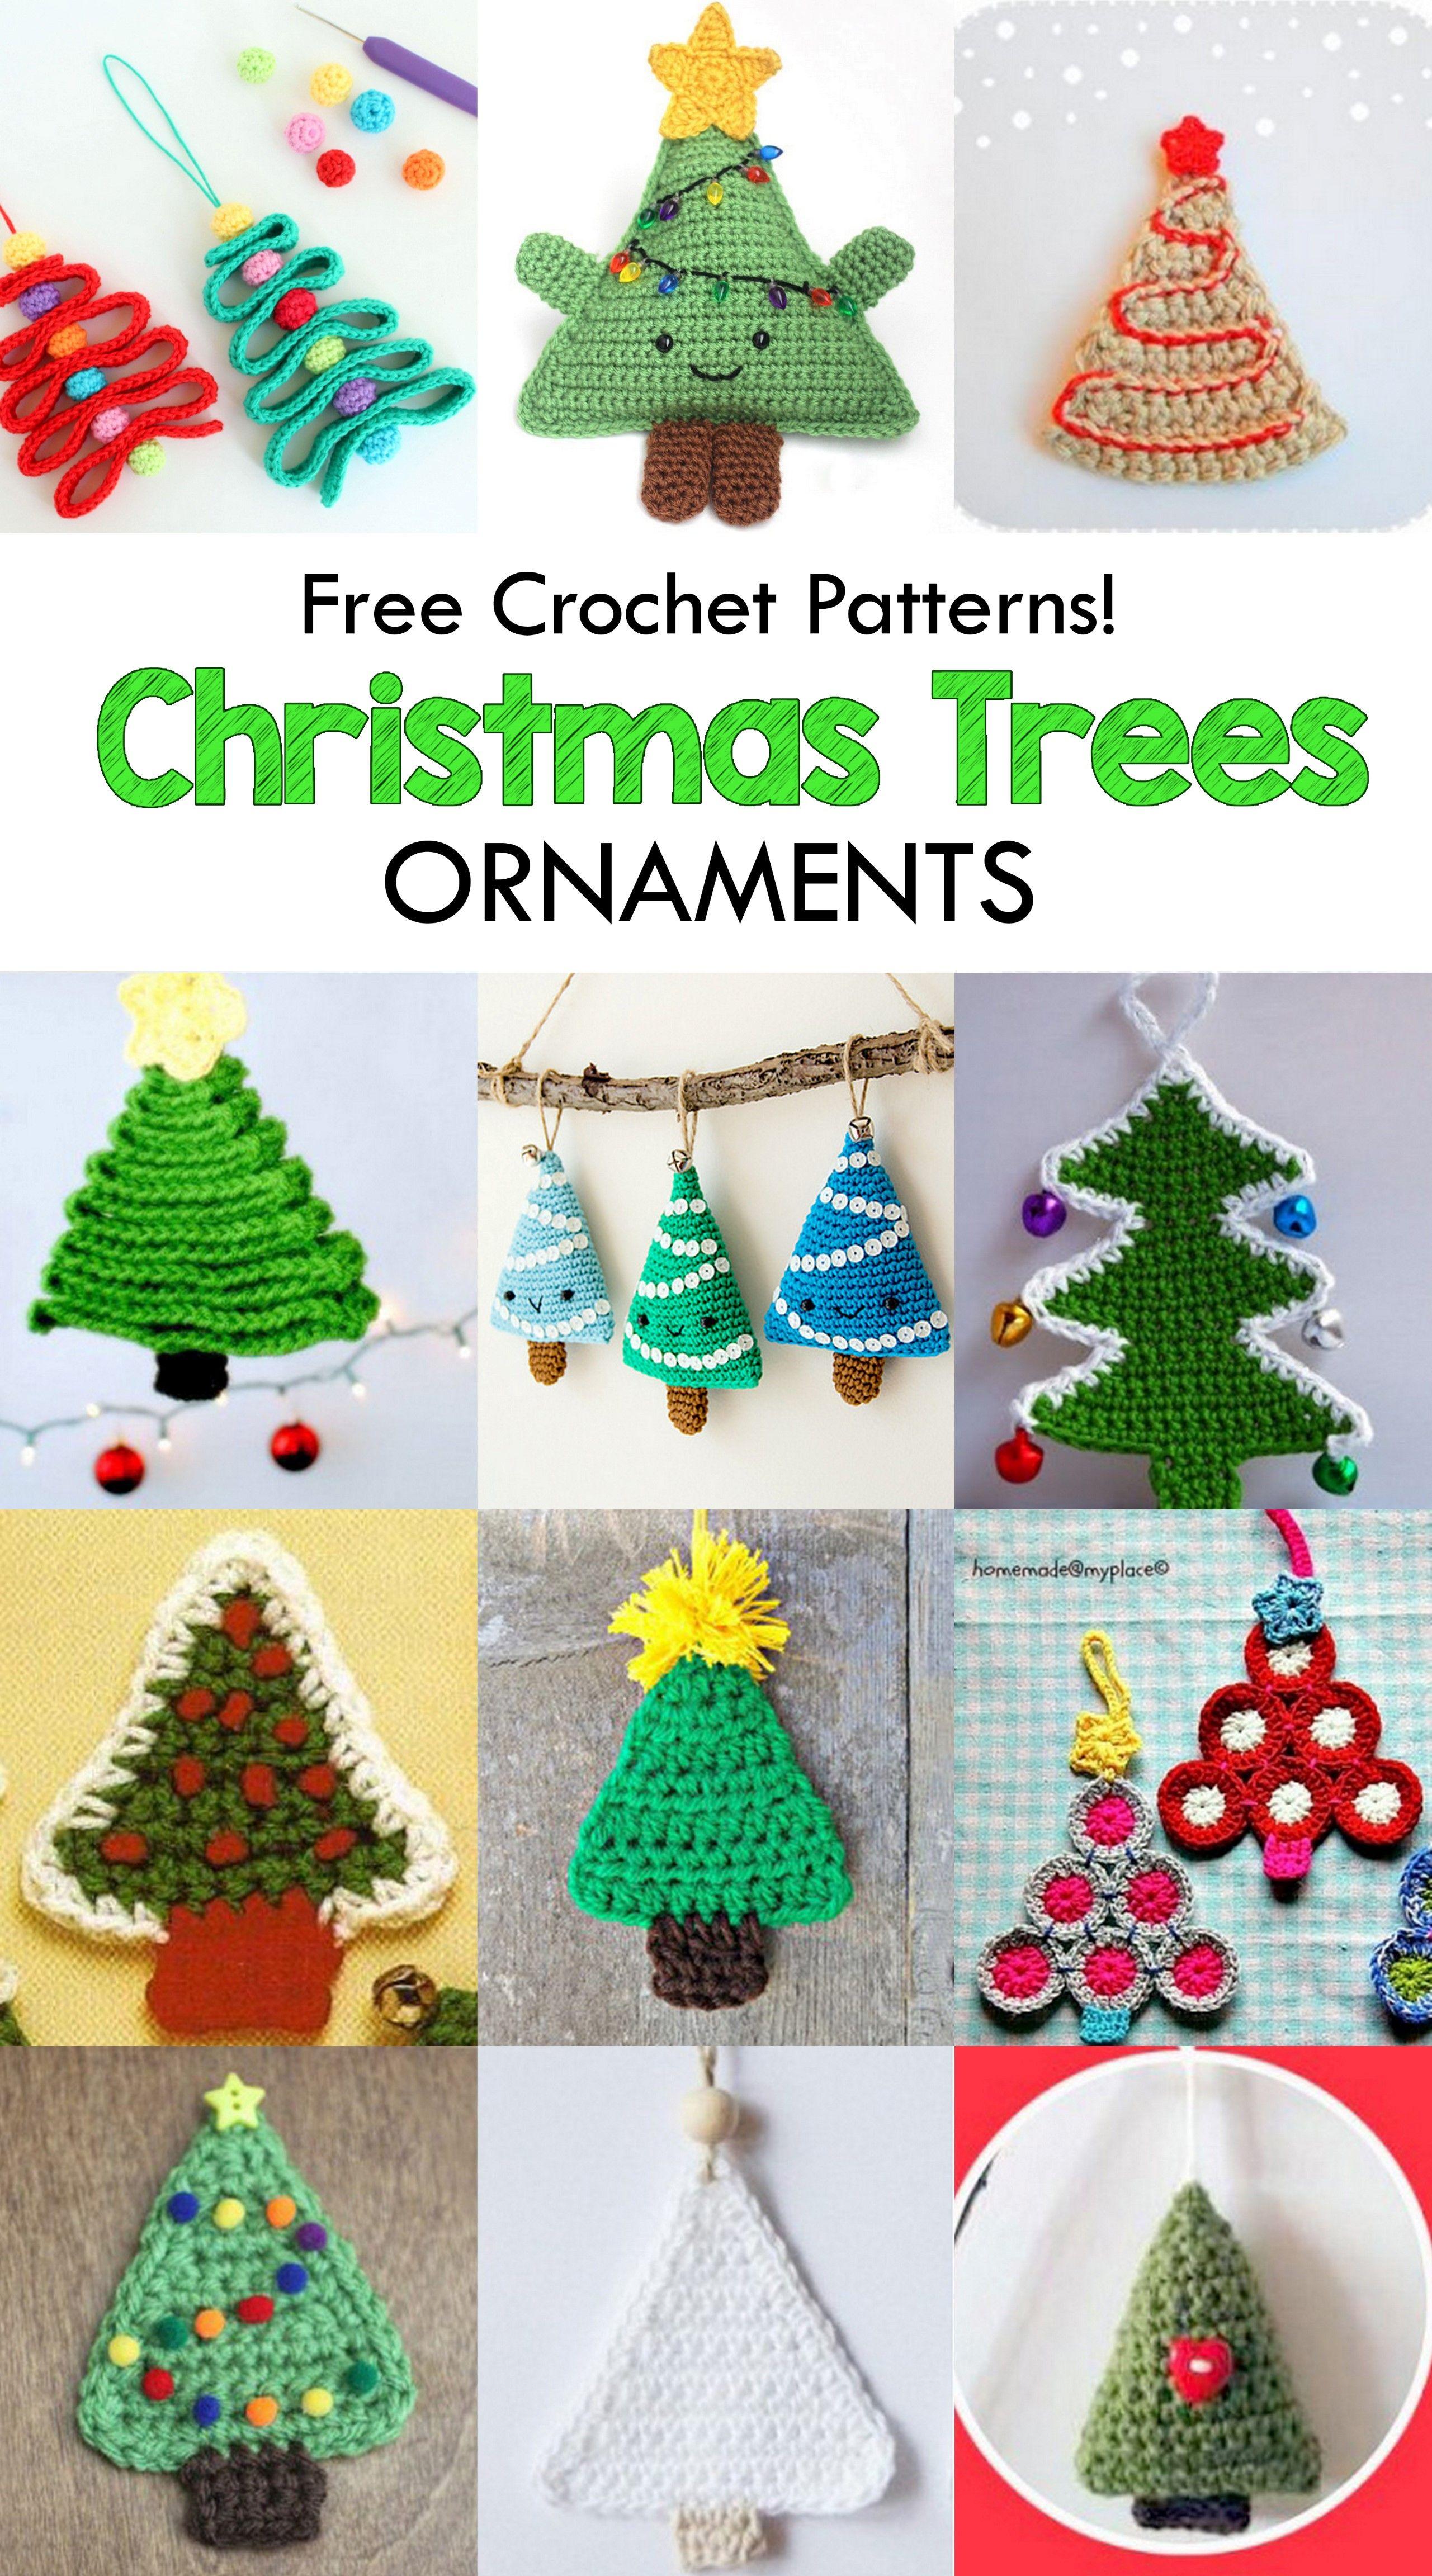 15 Free Christmas Tree Applique Crochet Patterns Crochet Christmas Decorations Christmas Crochet Patterns Christmas Crochet